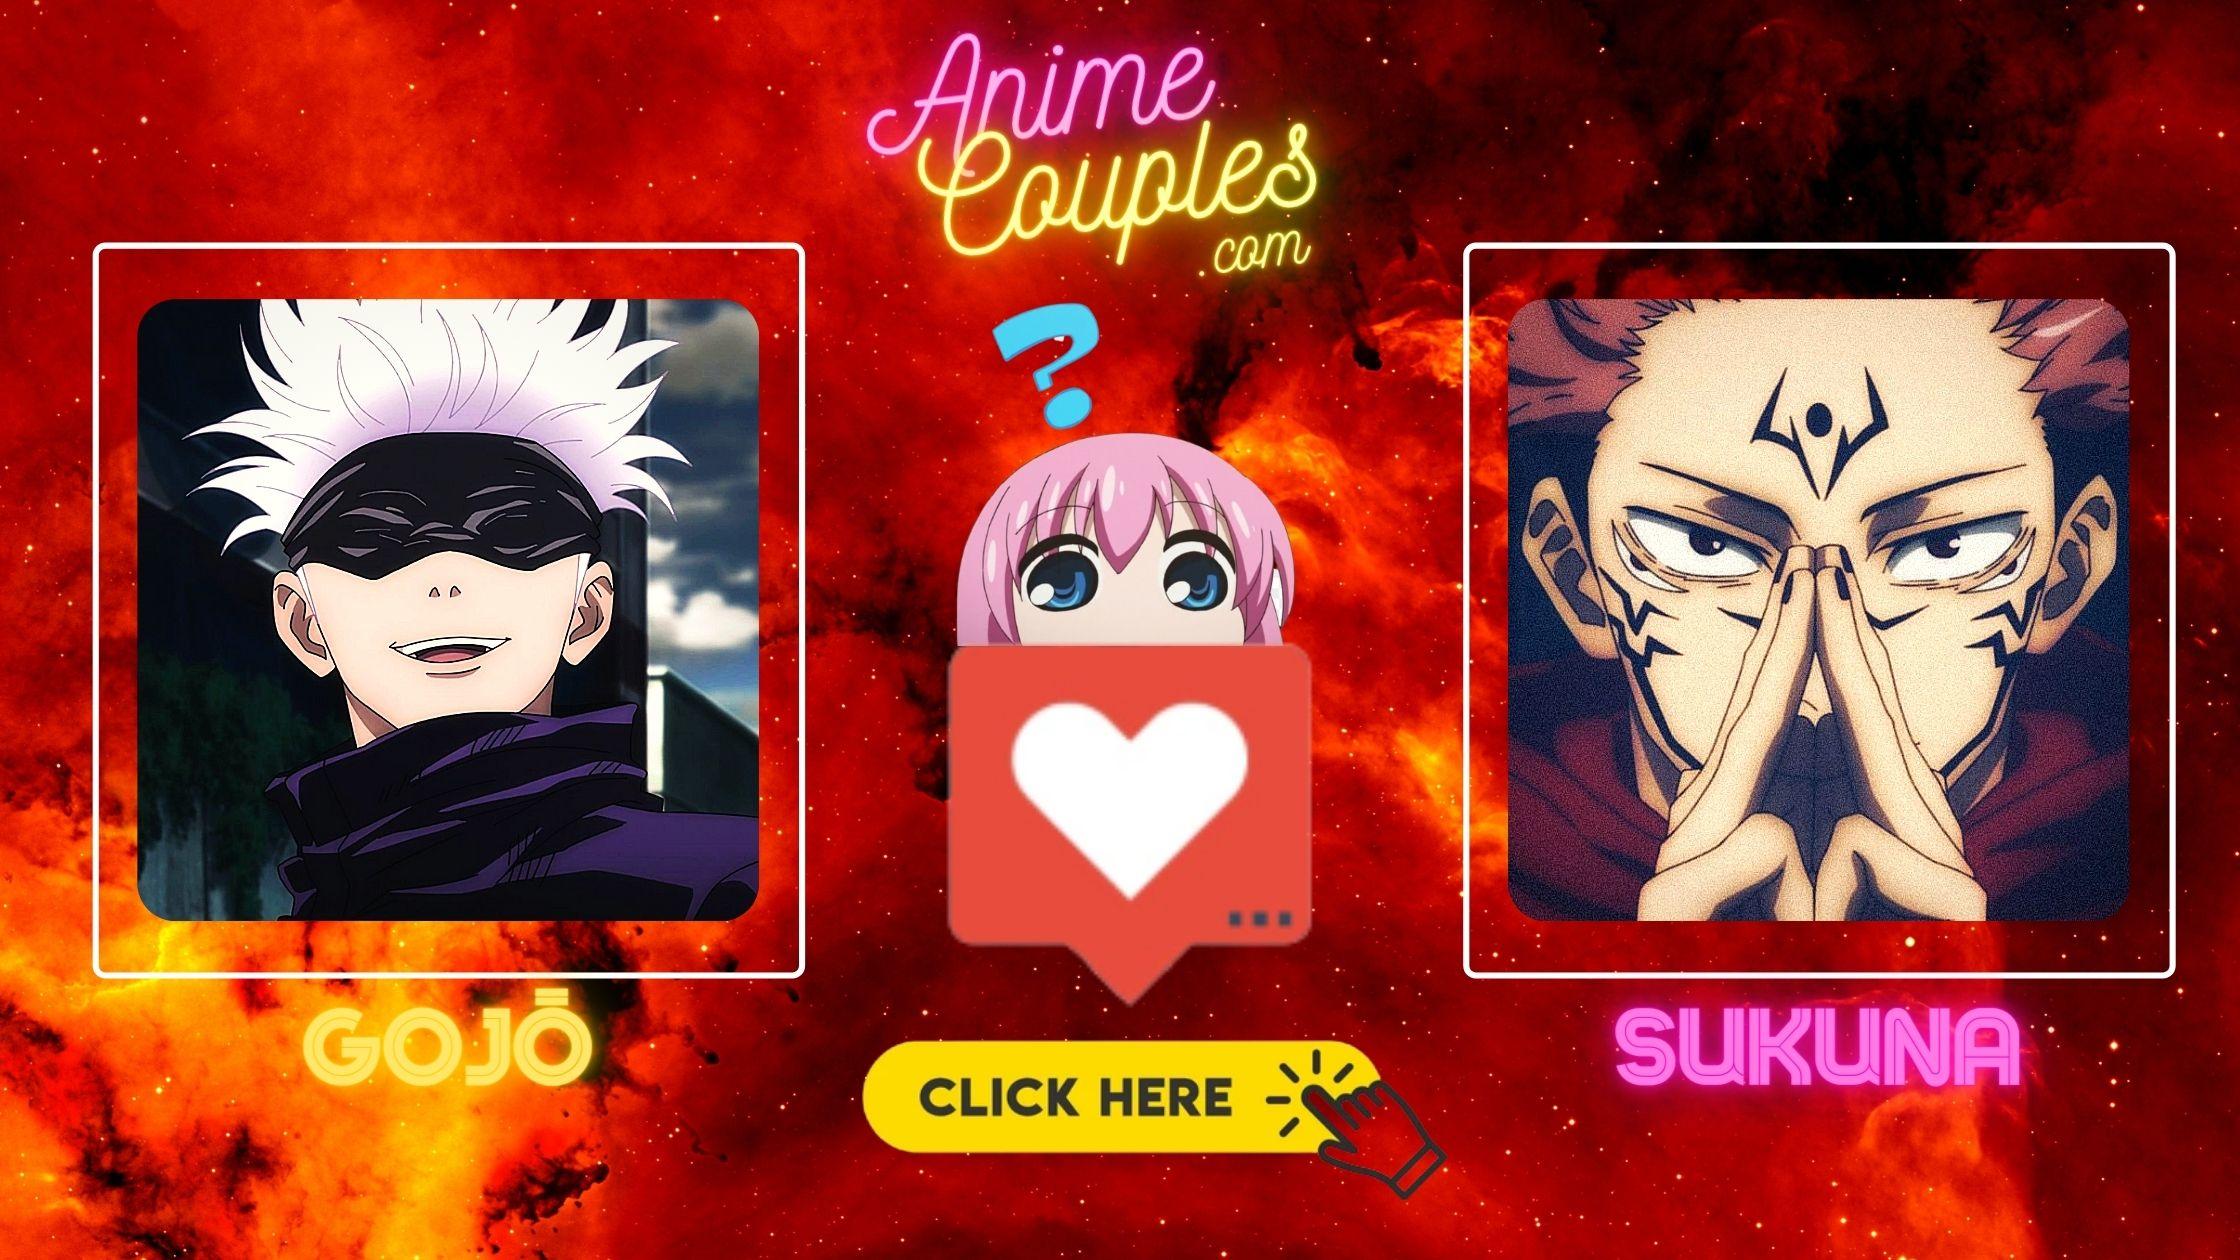 Gojo vs Sukuna - The Jujutsu Kaisen couples